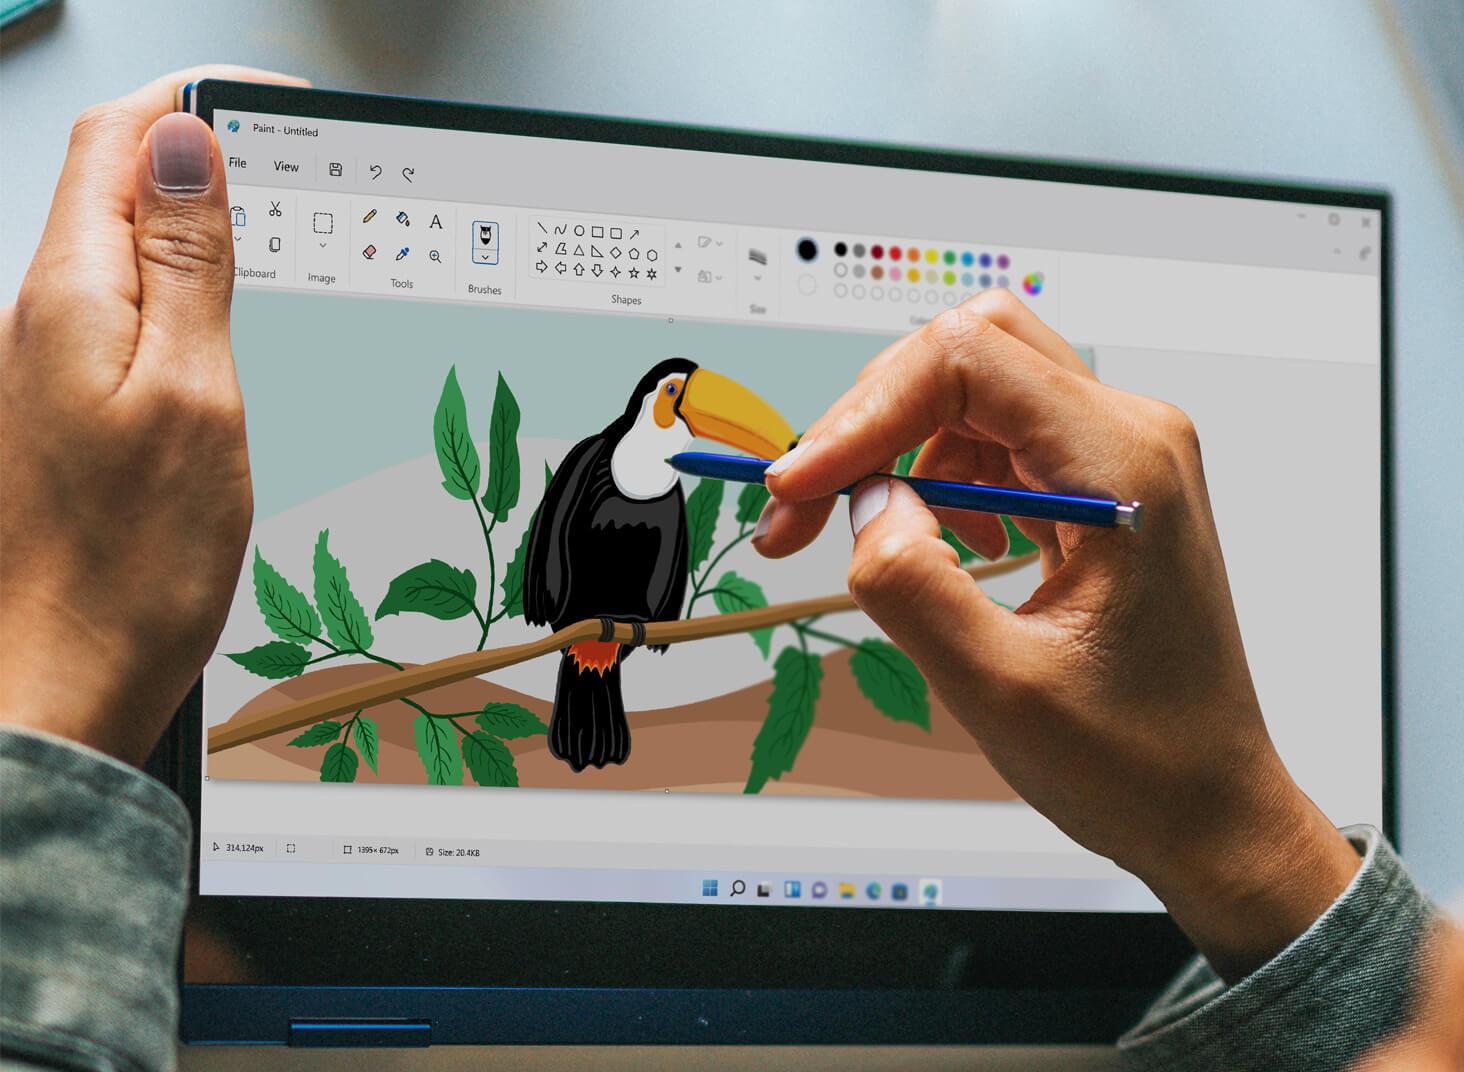 New Windows 11 Paint UI